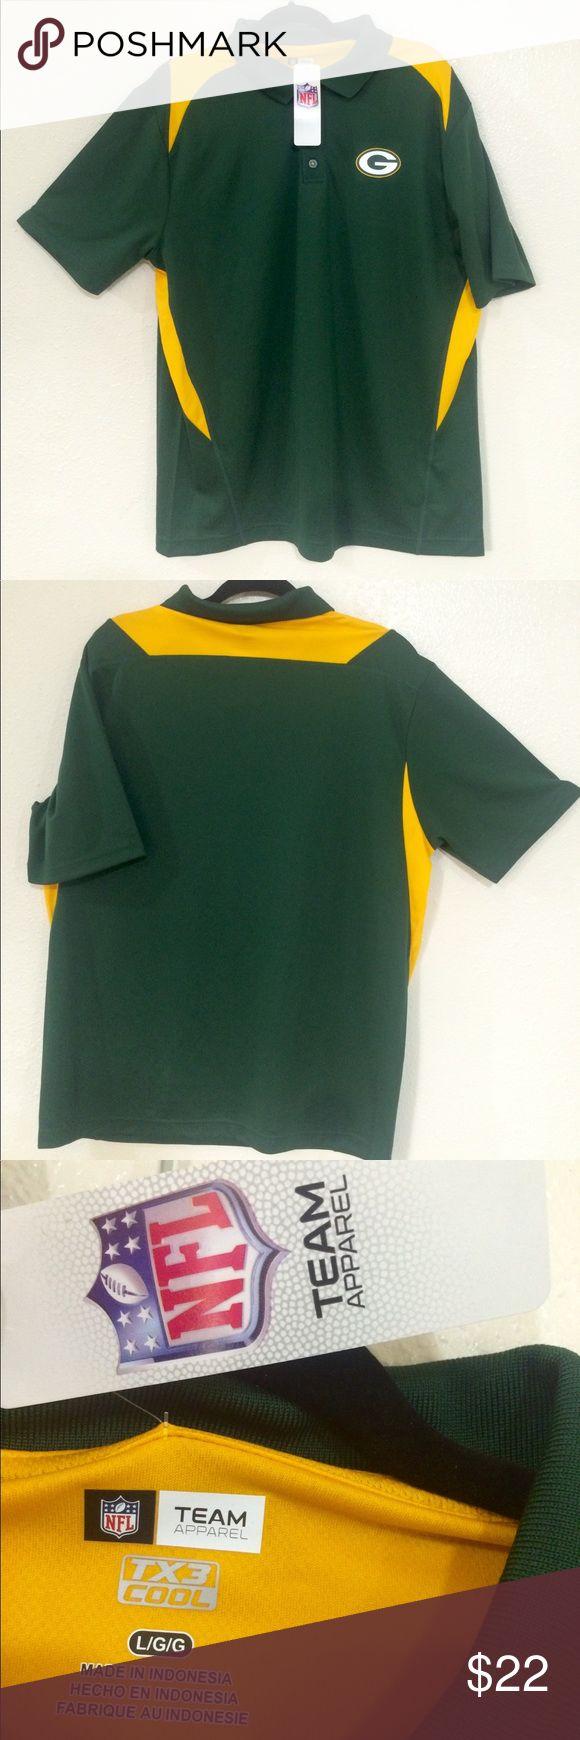 Green Bay Packers Men Shirt • Original NFL Team Apparel • TX3 Cool Technology • 100% Polyetser  Approximate measurements Chest (Pit to pit): 22in Hem (Side to side): 20in Shoulder (hem to hem): 20in Length (back neckline to bottom): 30in NFL Team Apparel Shirts Polos